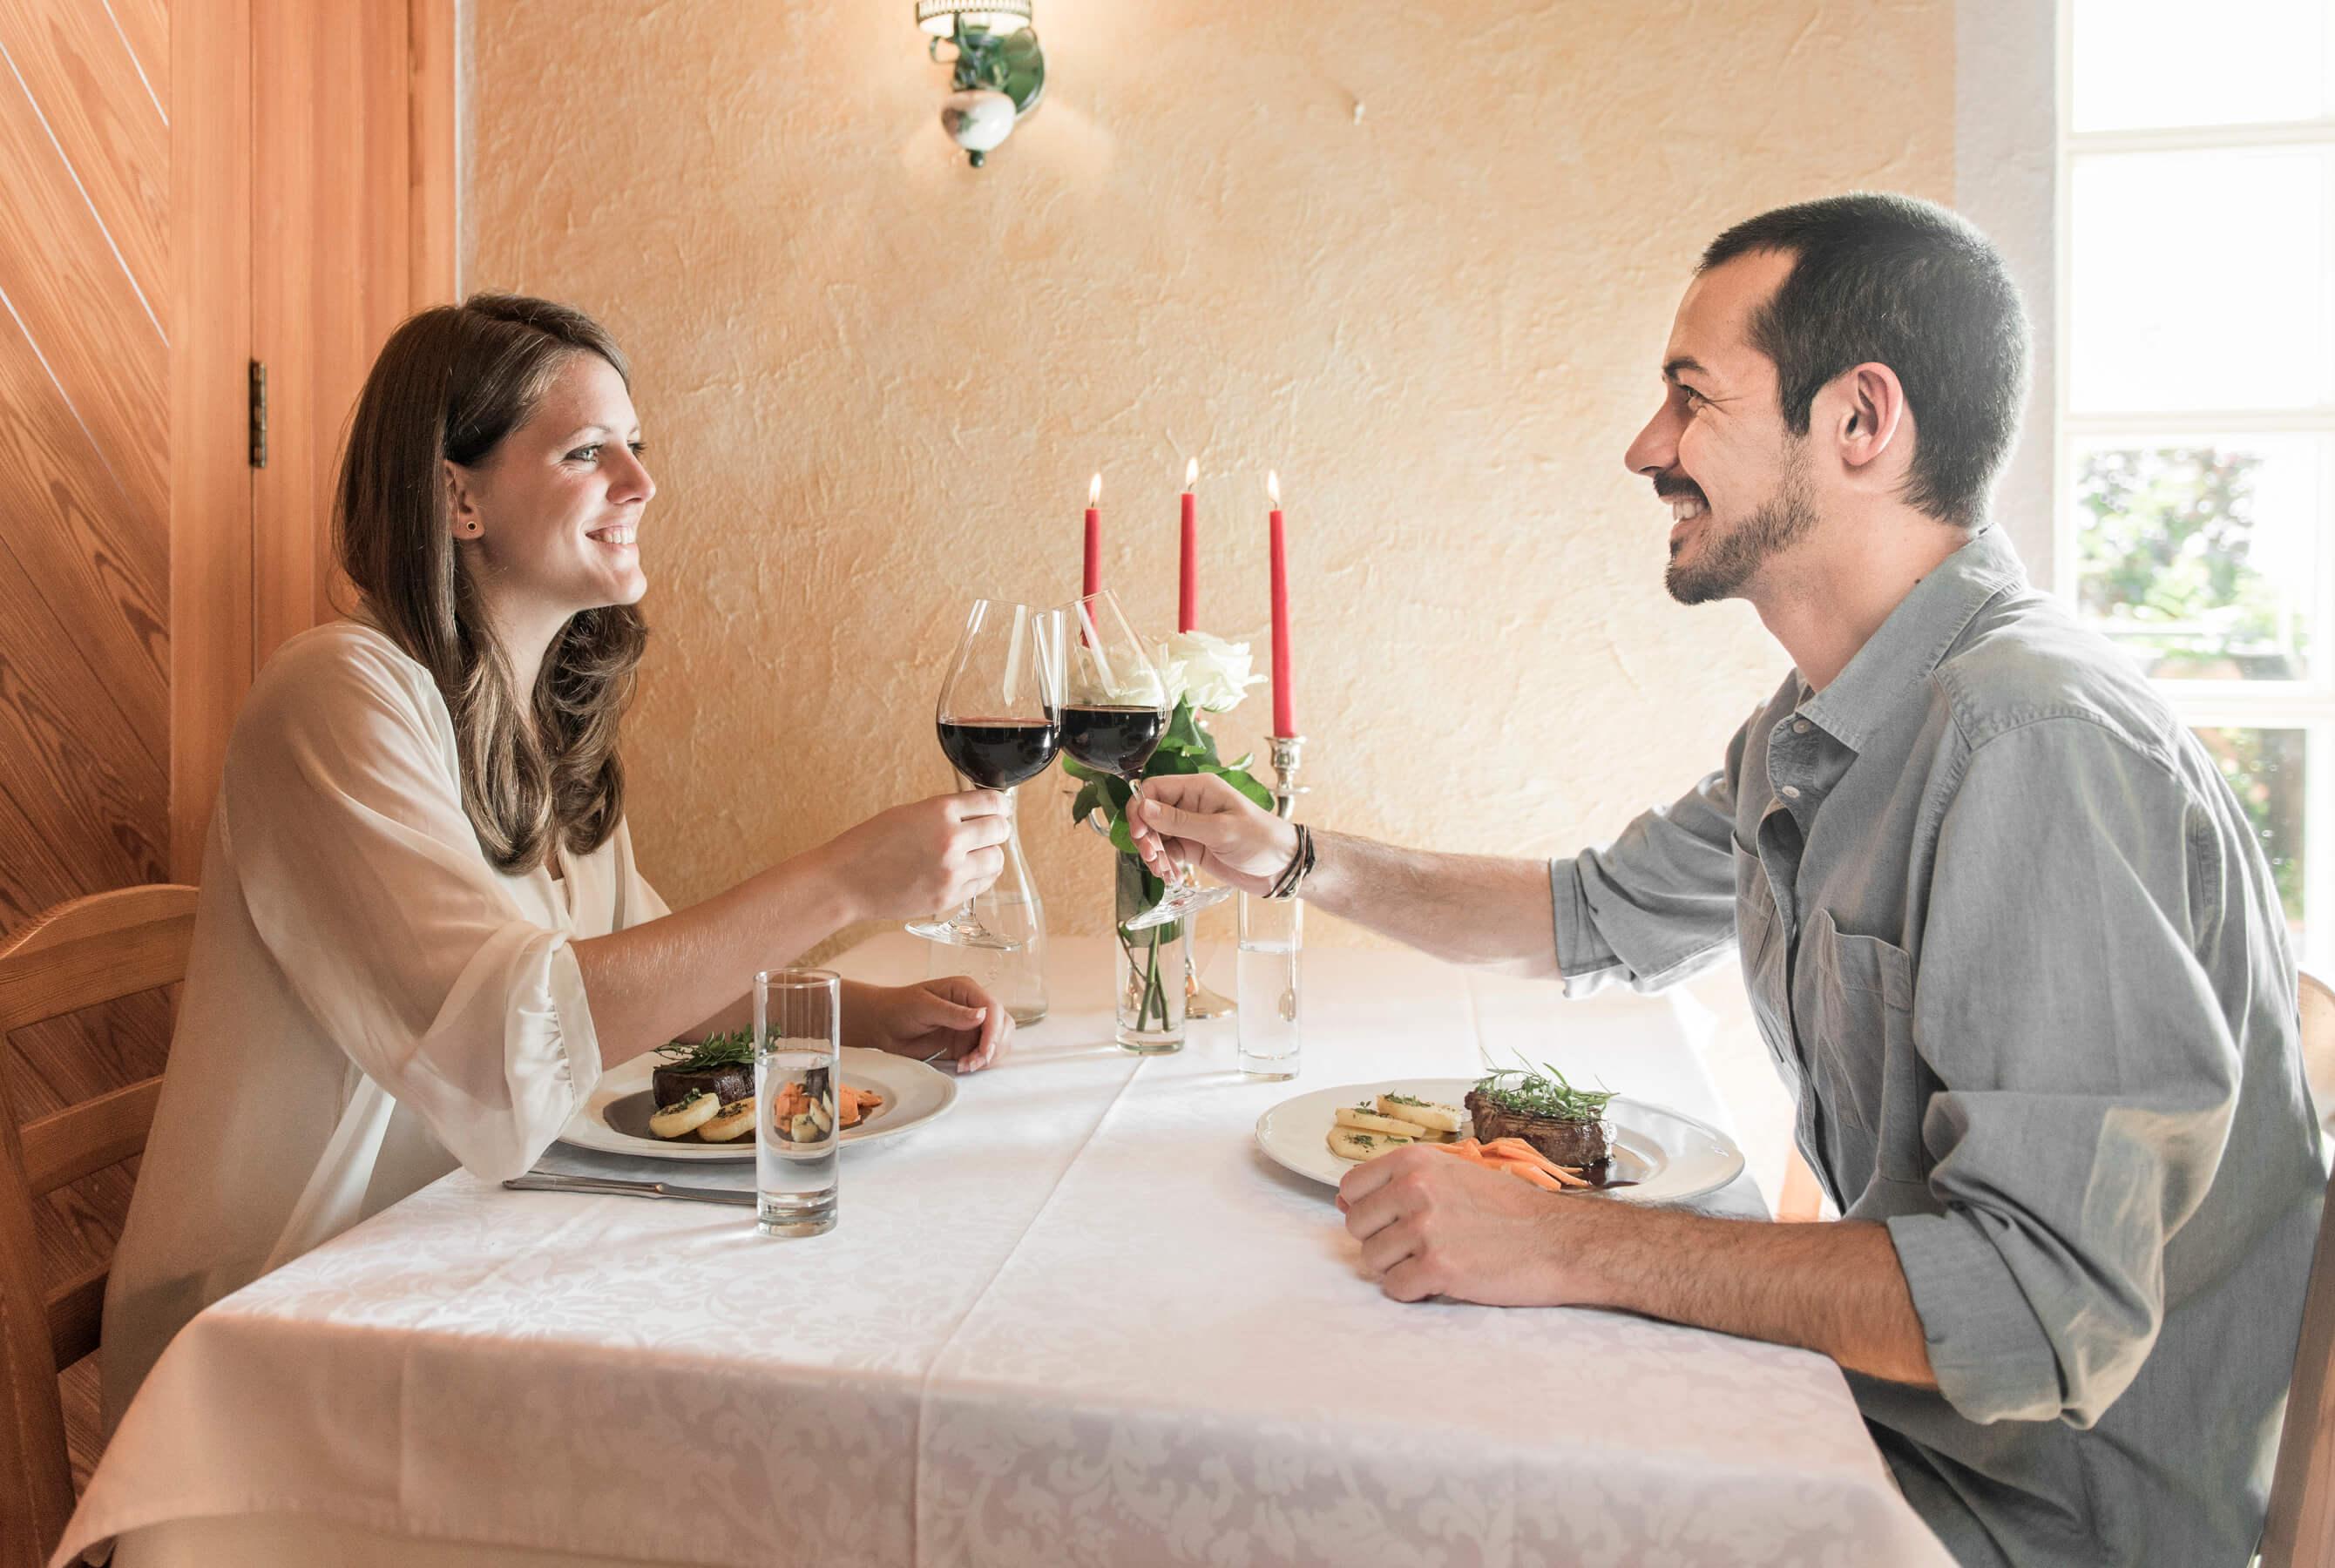 Dinner, Romantik, Paar